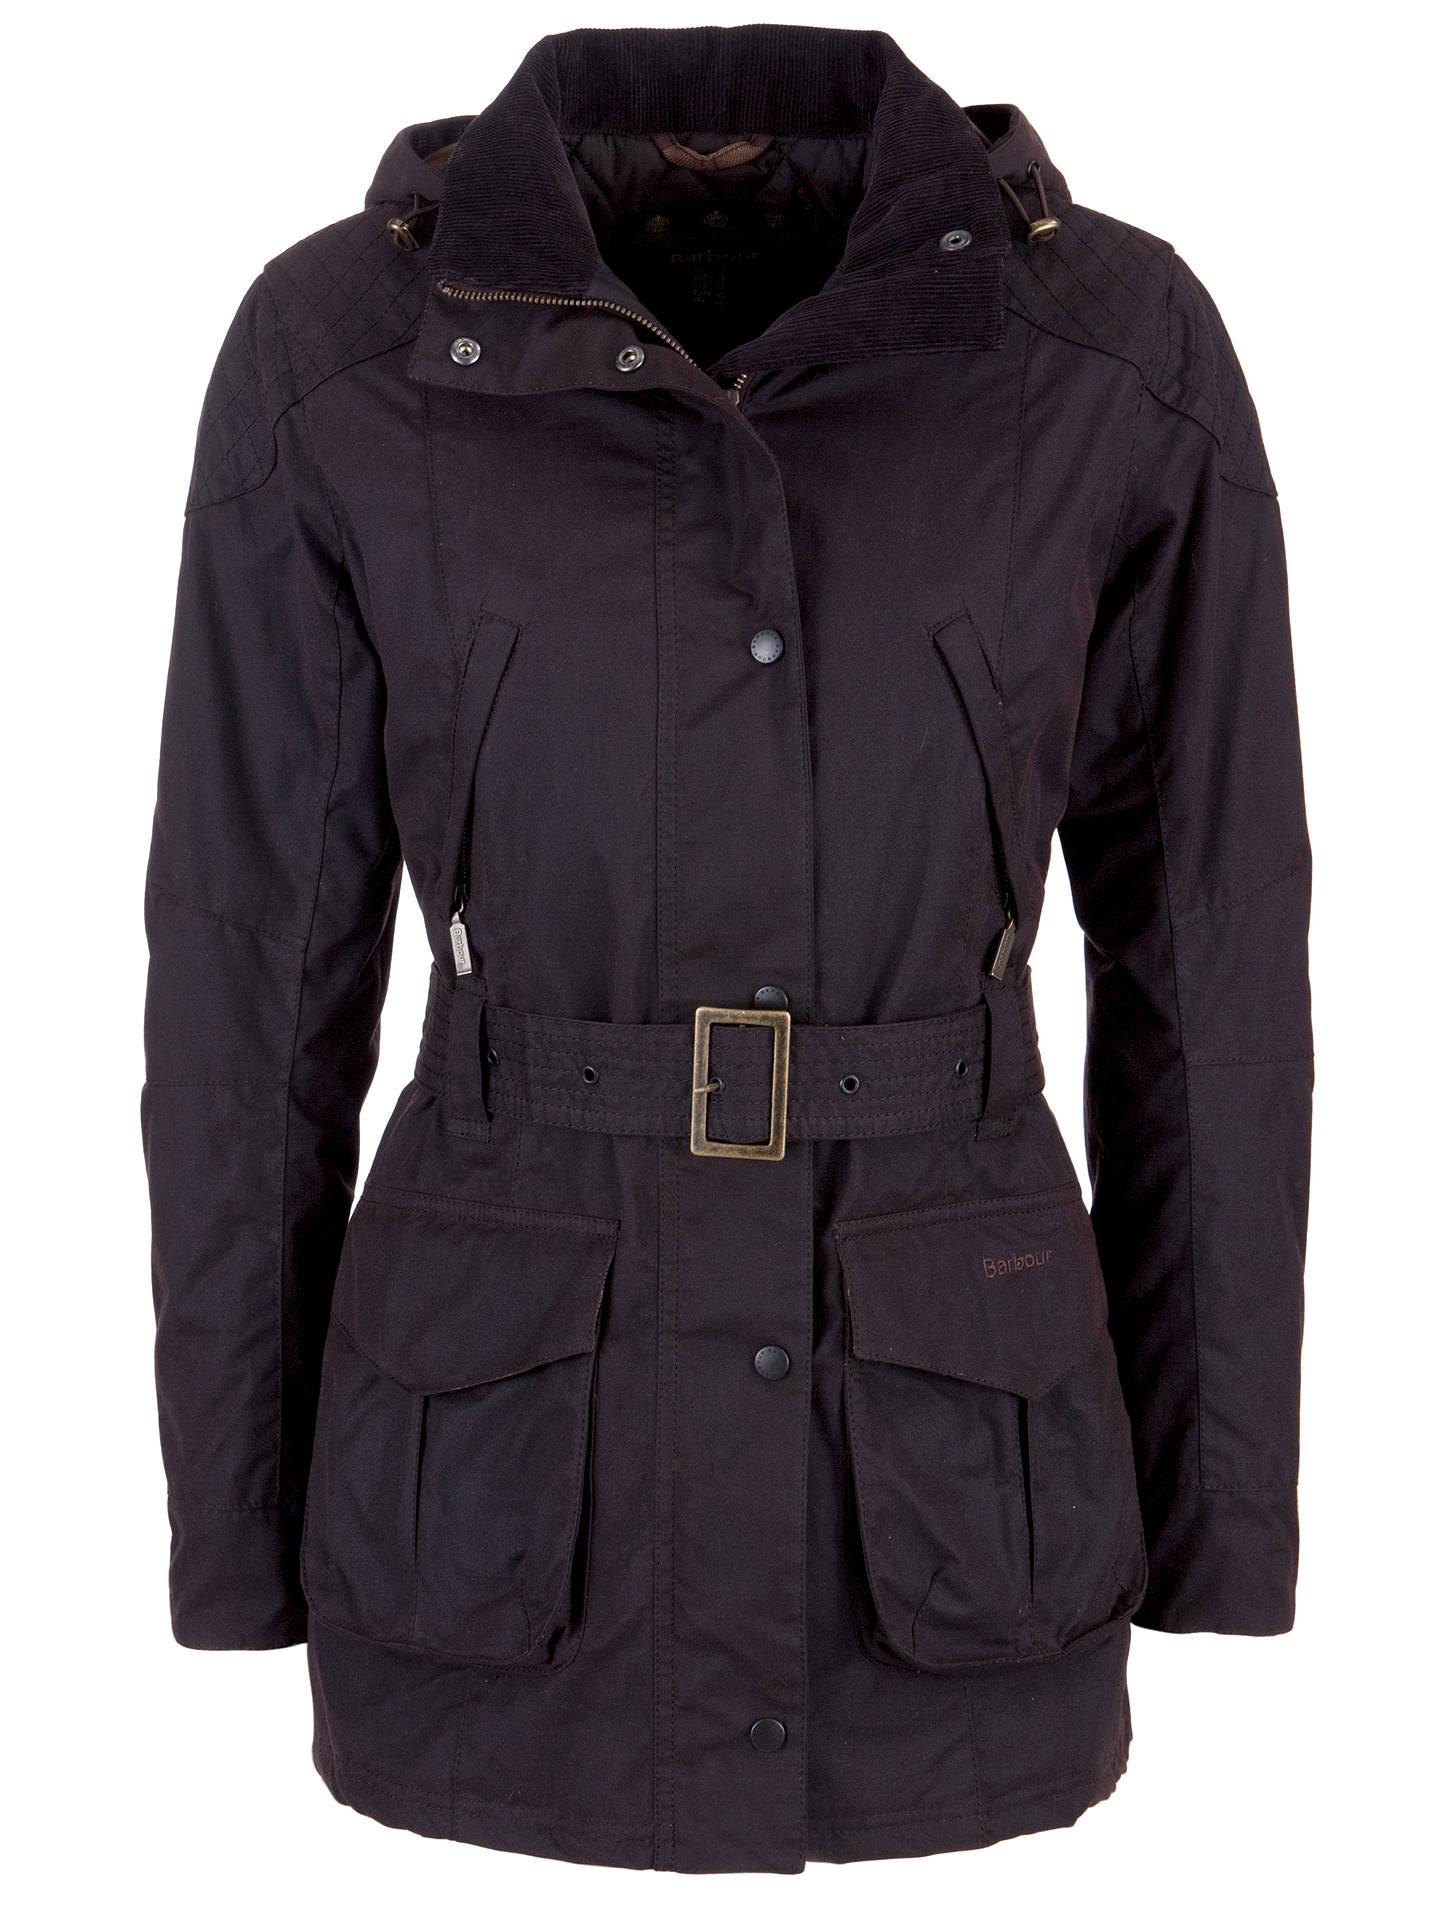 a56000ca40 Buy Barbour International Rebel Waxed Jacket, Rustic, 10 Online at  johnlewis.com ...